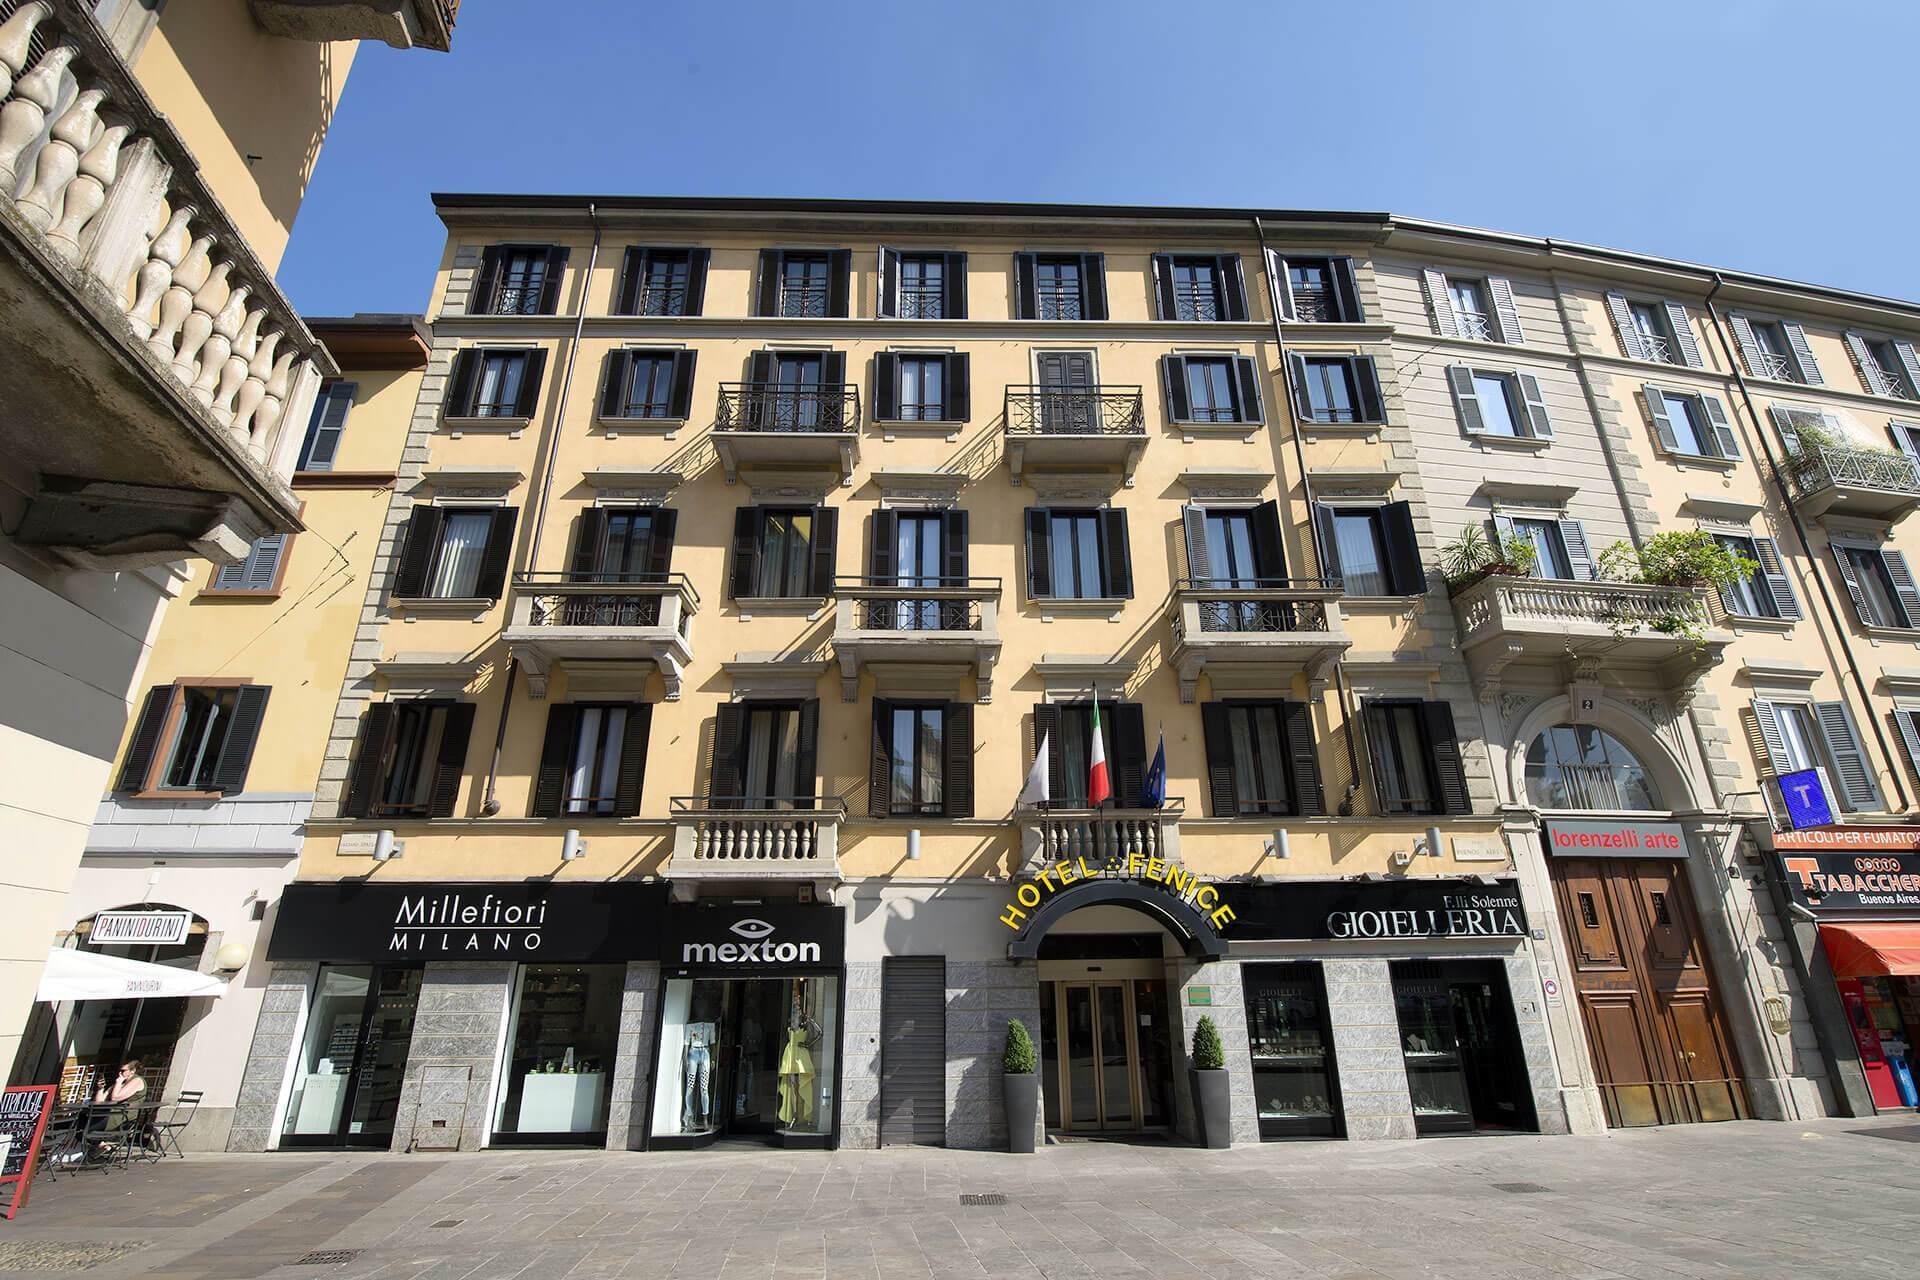 Hotel hotel fenice milano for Hotel fenice milano